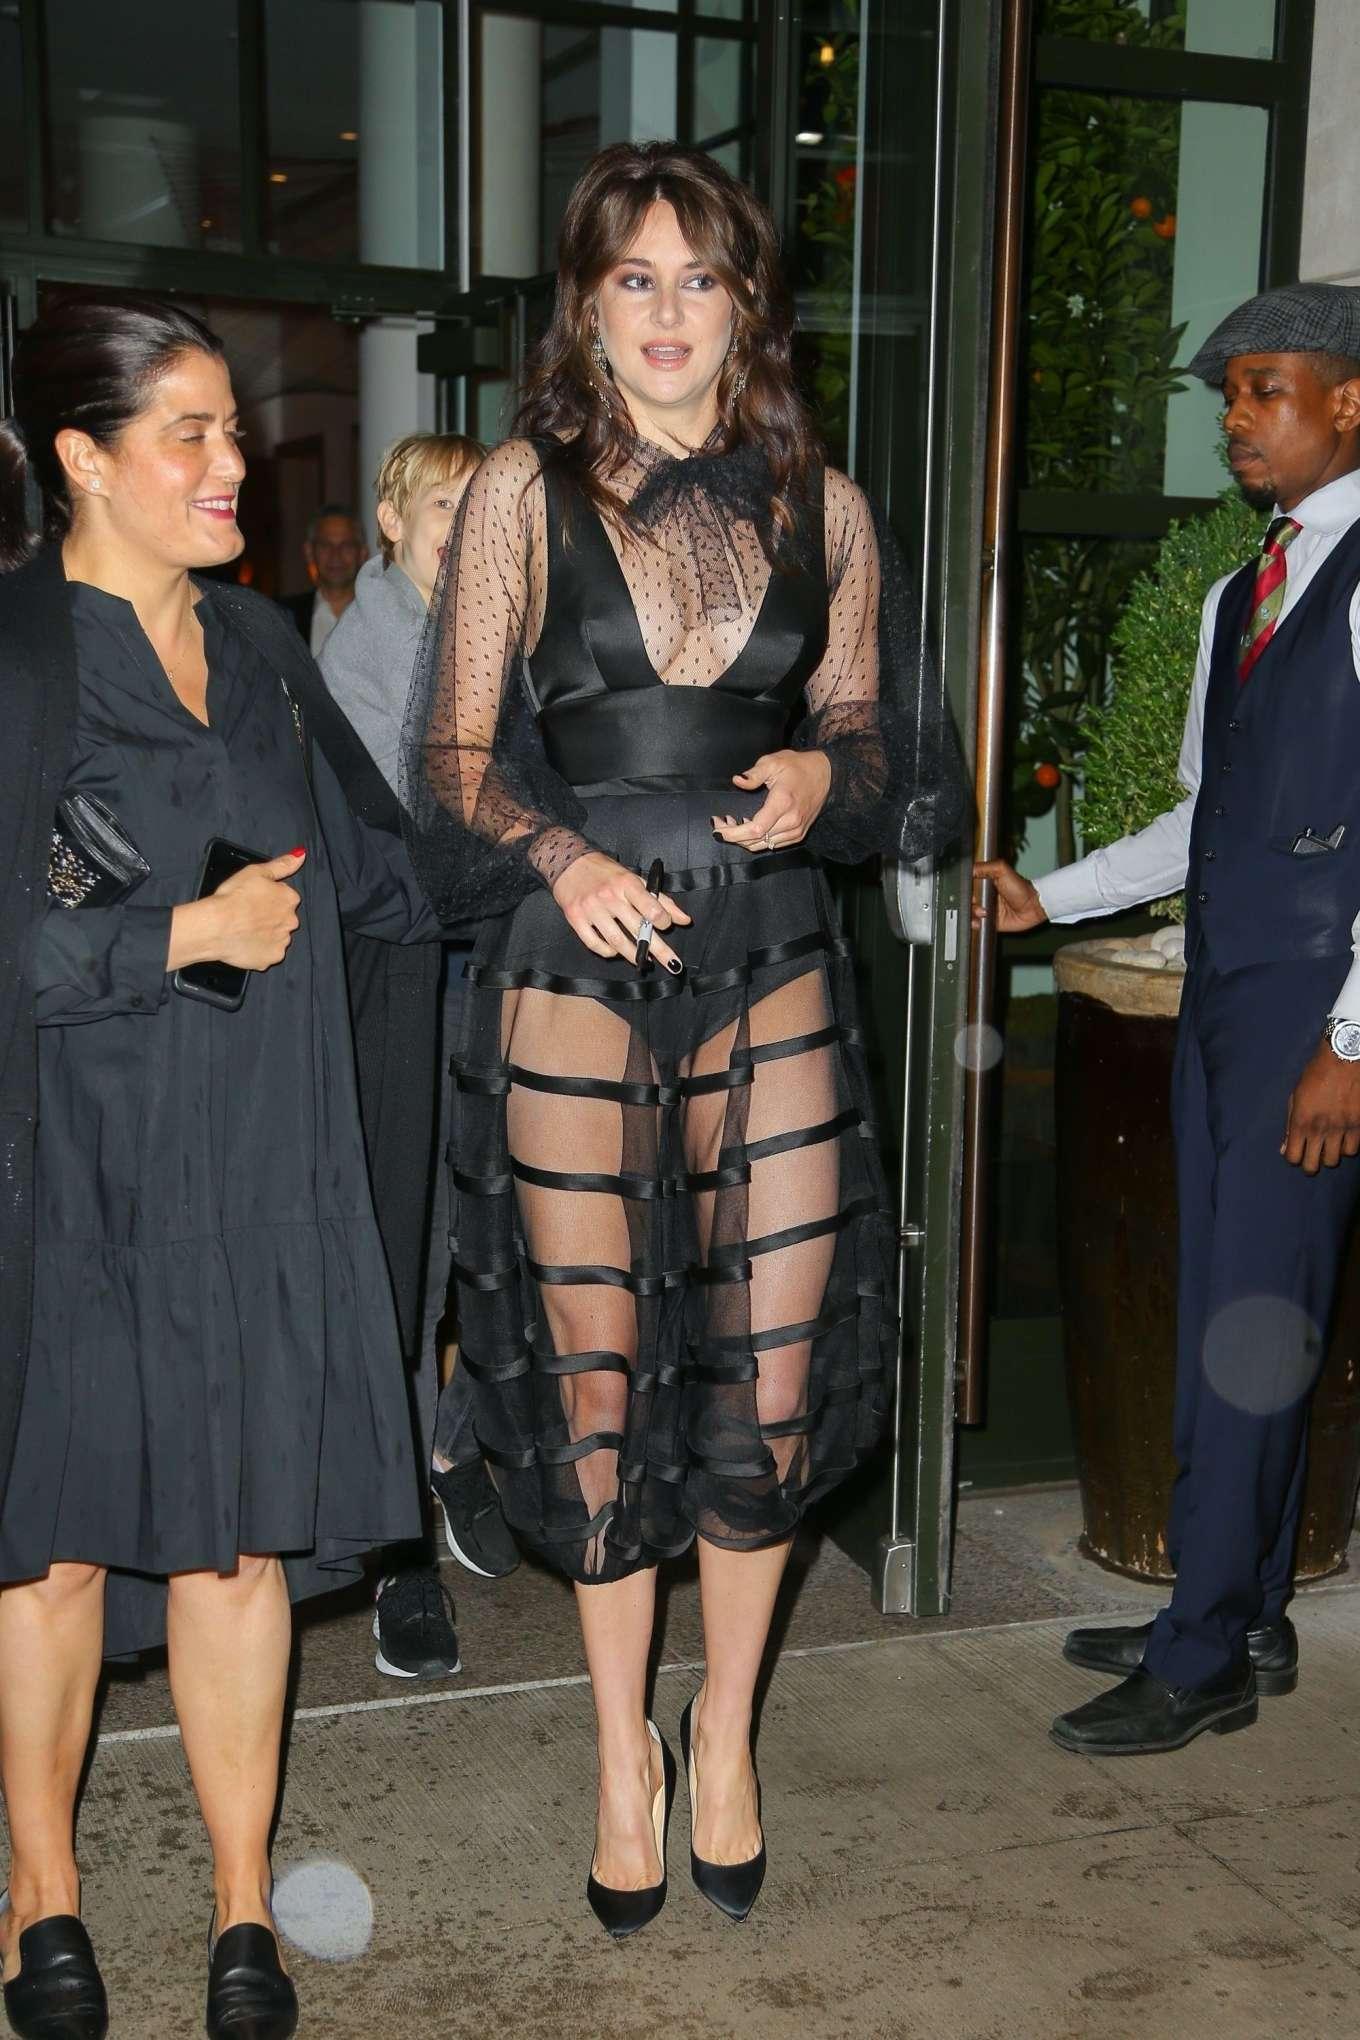 Shailene Woodley 2019 : Shailene Woodley: Leaves The Whitby Hotel-08